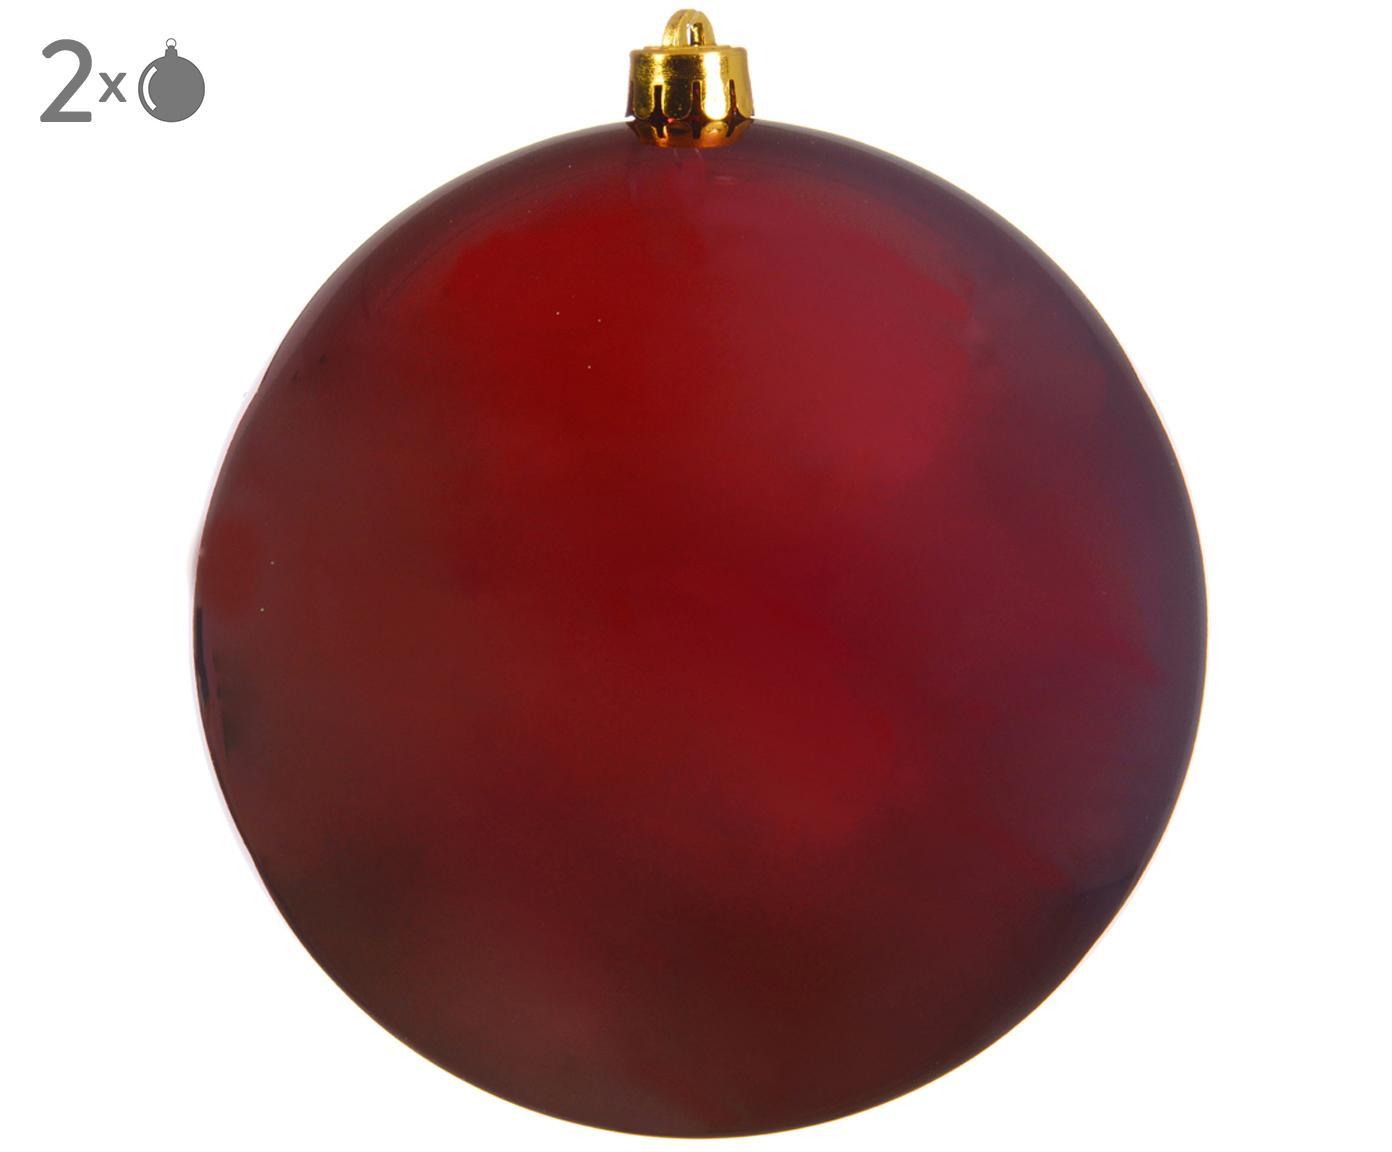 Palla di Natale Minstix, 2 pz., Materiale sintetico, Rosso, Ø 14 cm